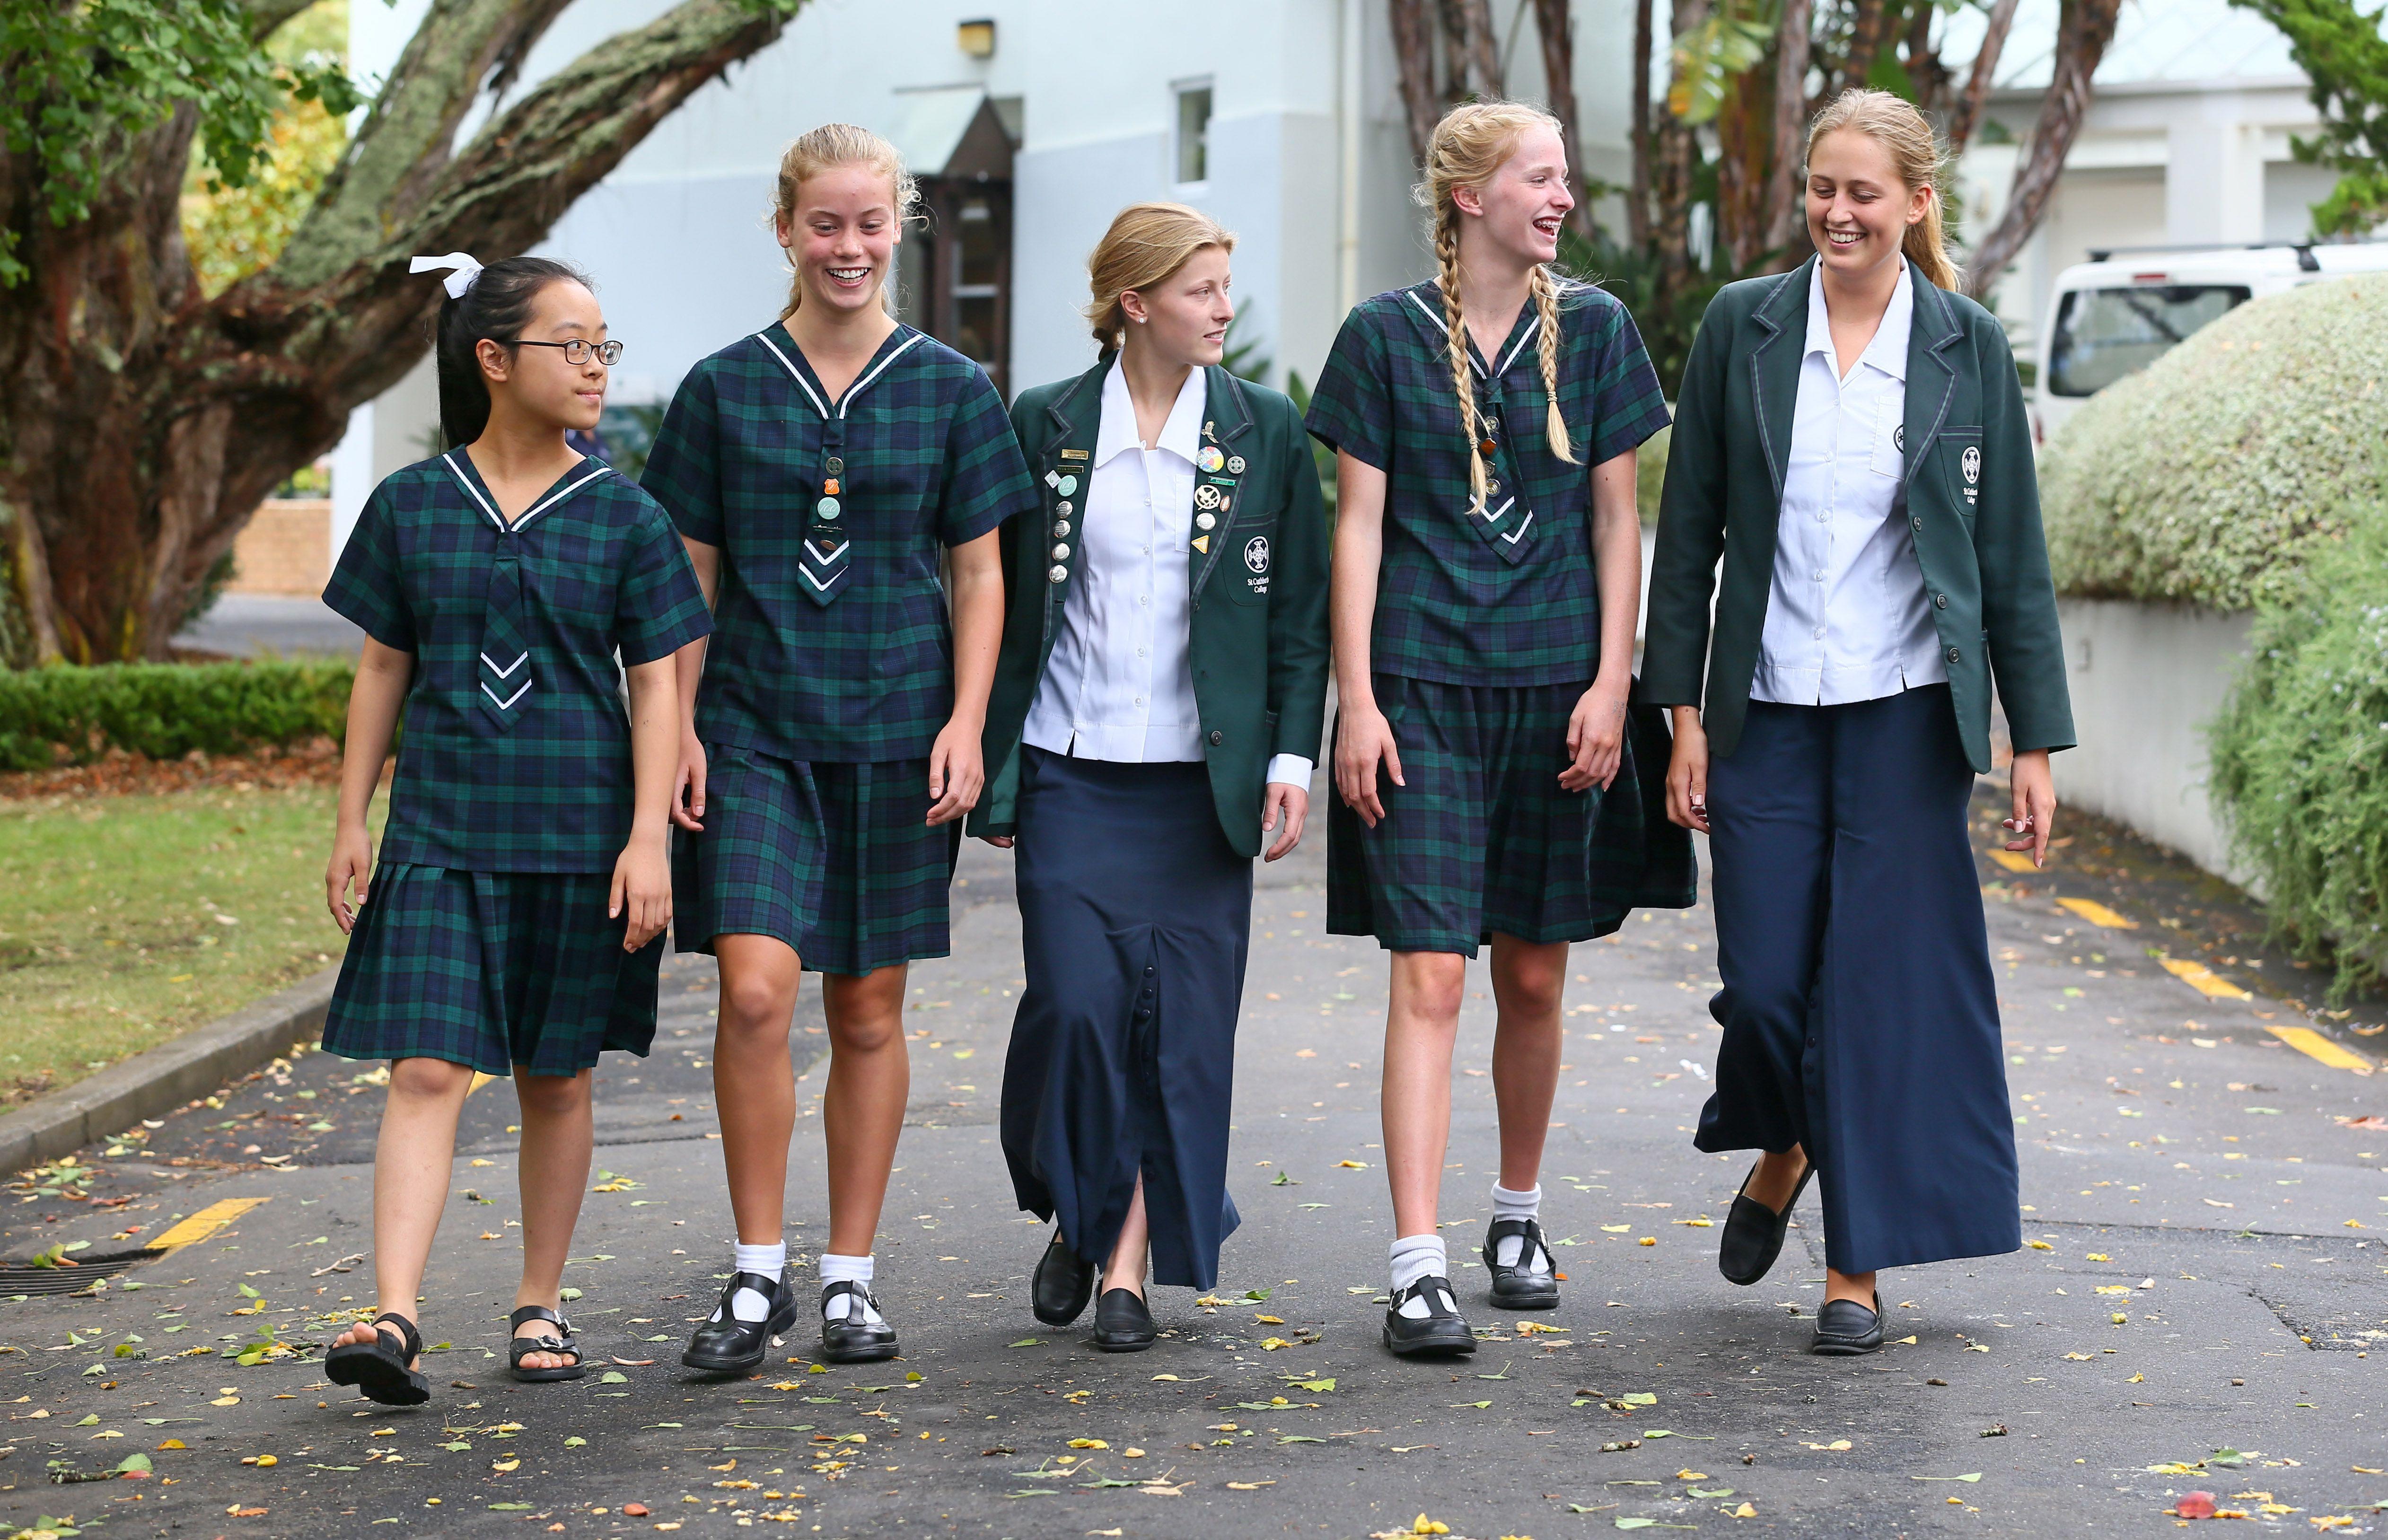 St Cuthbert's Wild School for Boys